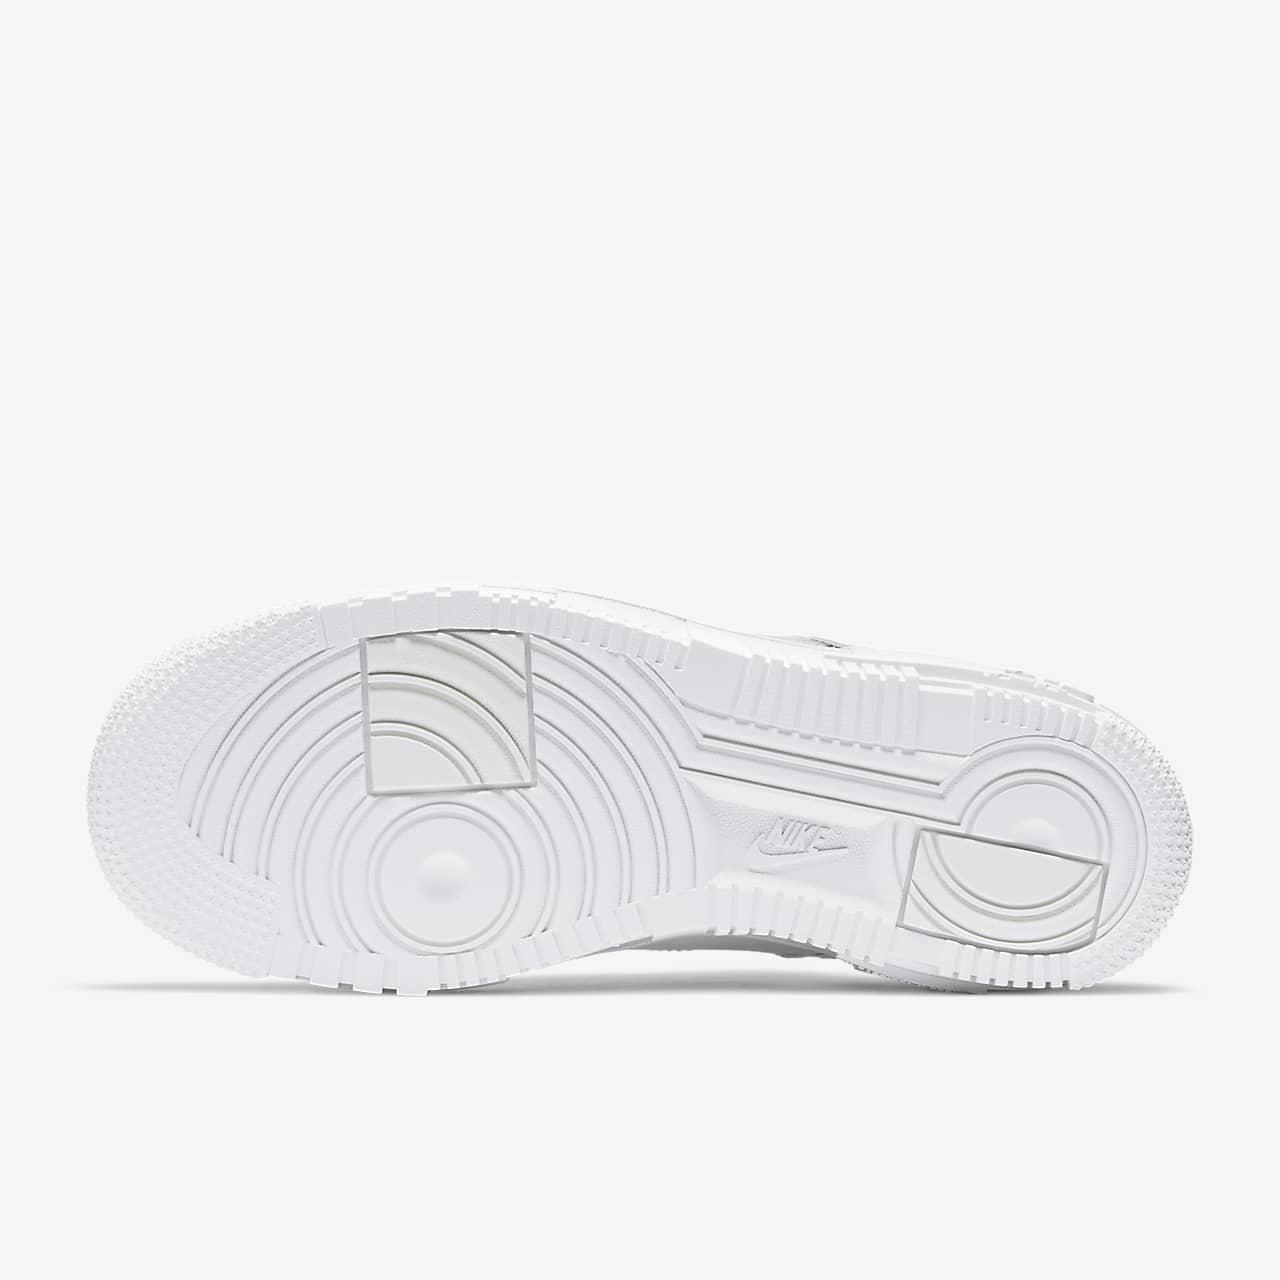 Nike Air Force 1 Pixel White